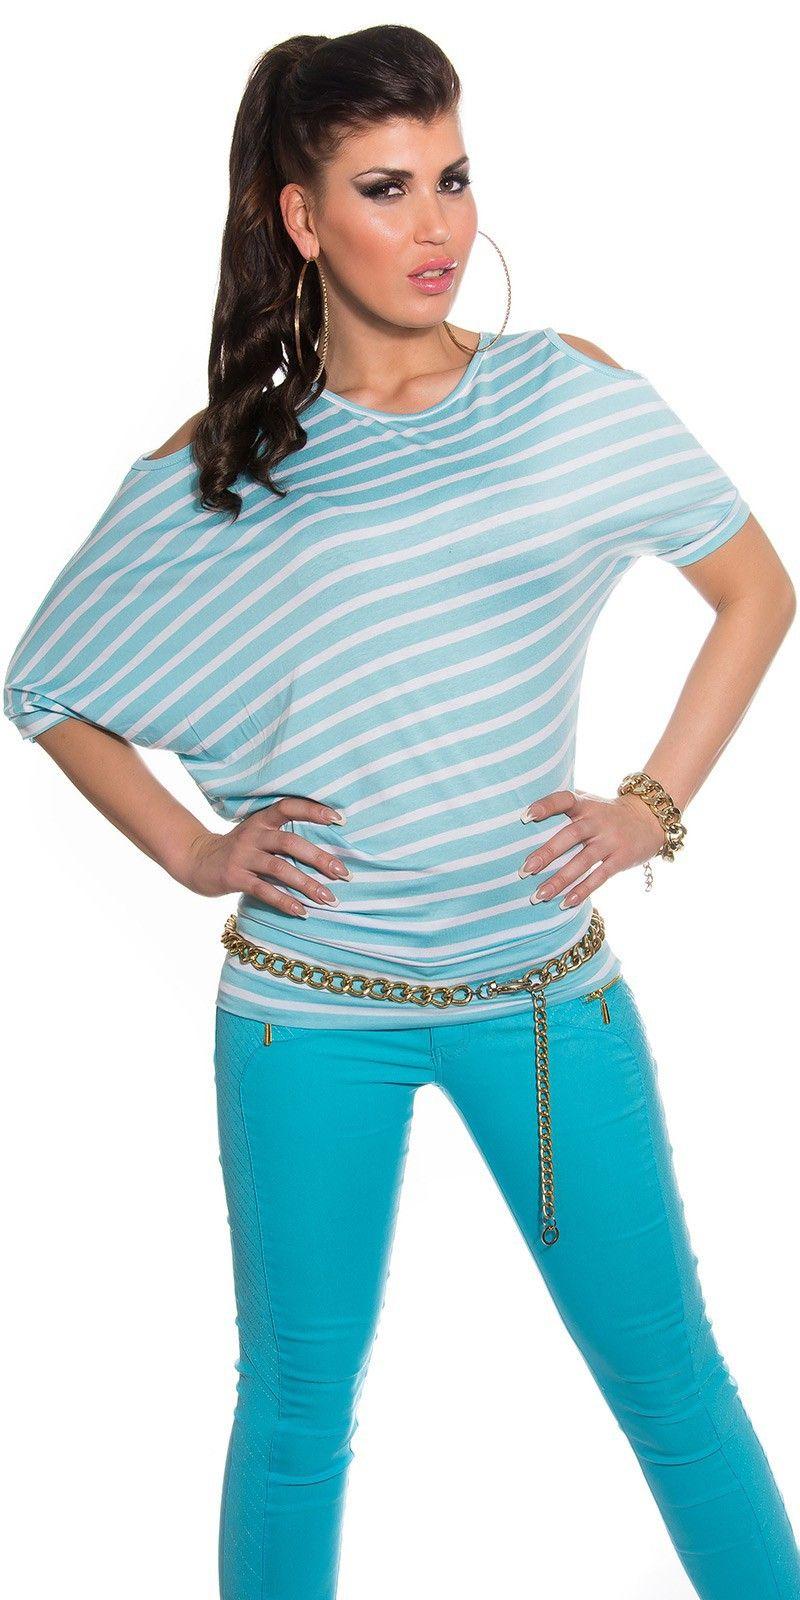 Camiseta murcielago rayada Modelo  MX3605 Camiseta con mangas de murcielago de tapiz rayado adornada con aberturas en los hombros.  Composicion: 95 % viscose / 5 % elastane